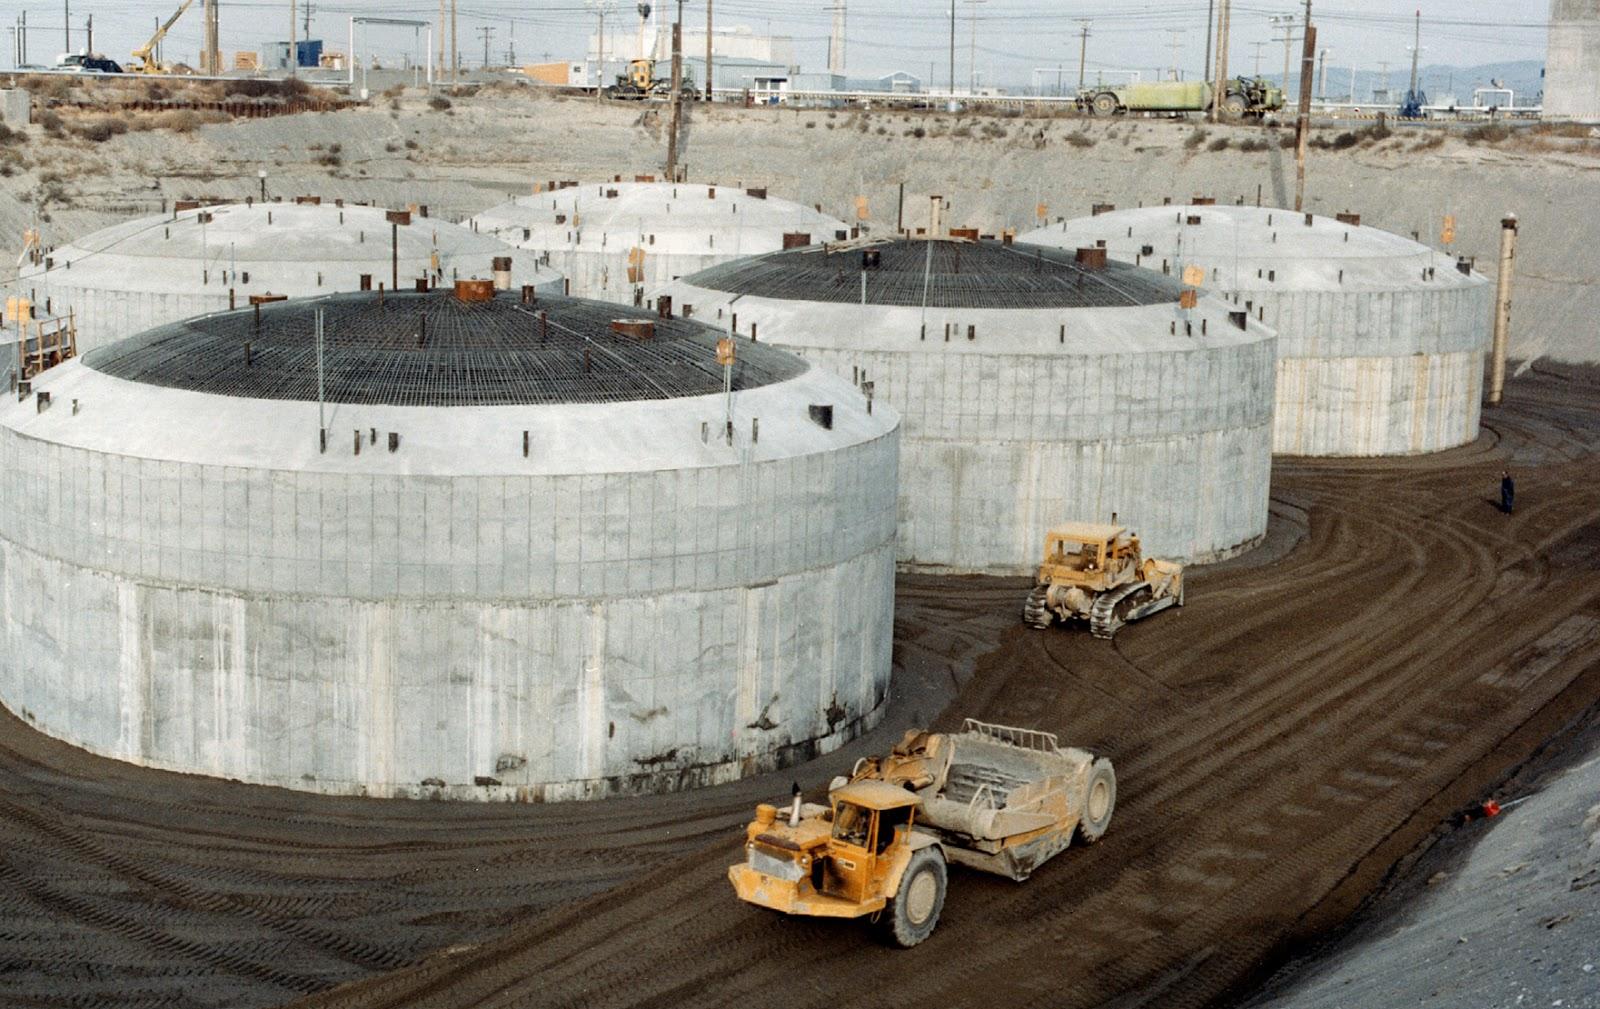 4_tank_wrapped in concrete (002).jpg